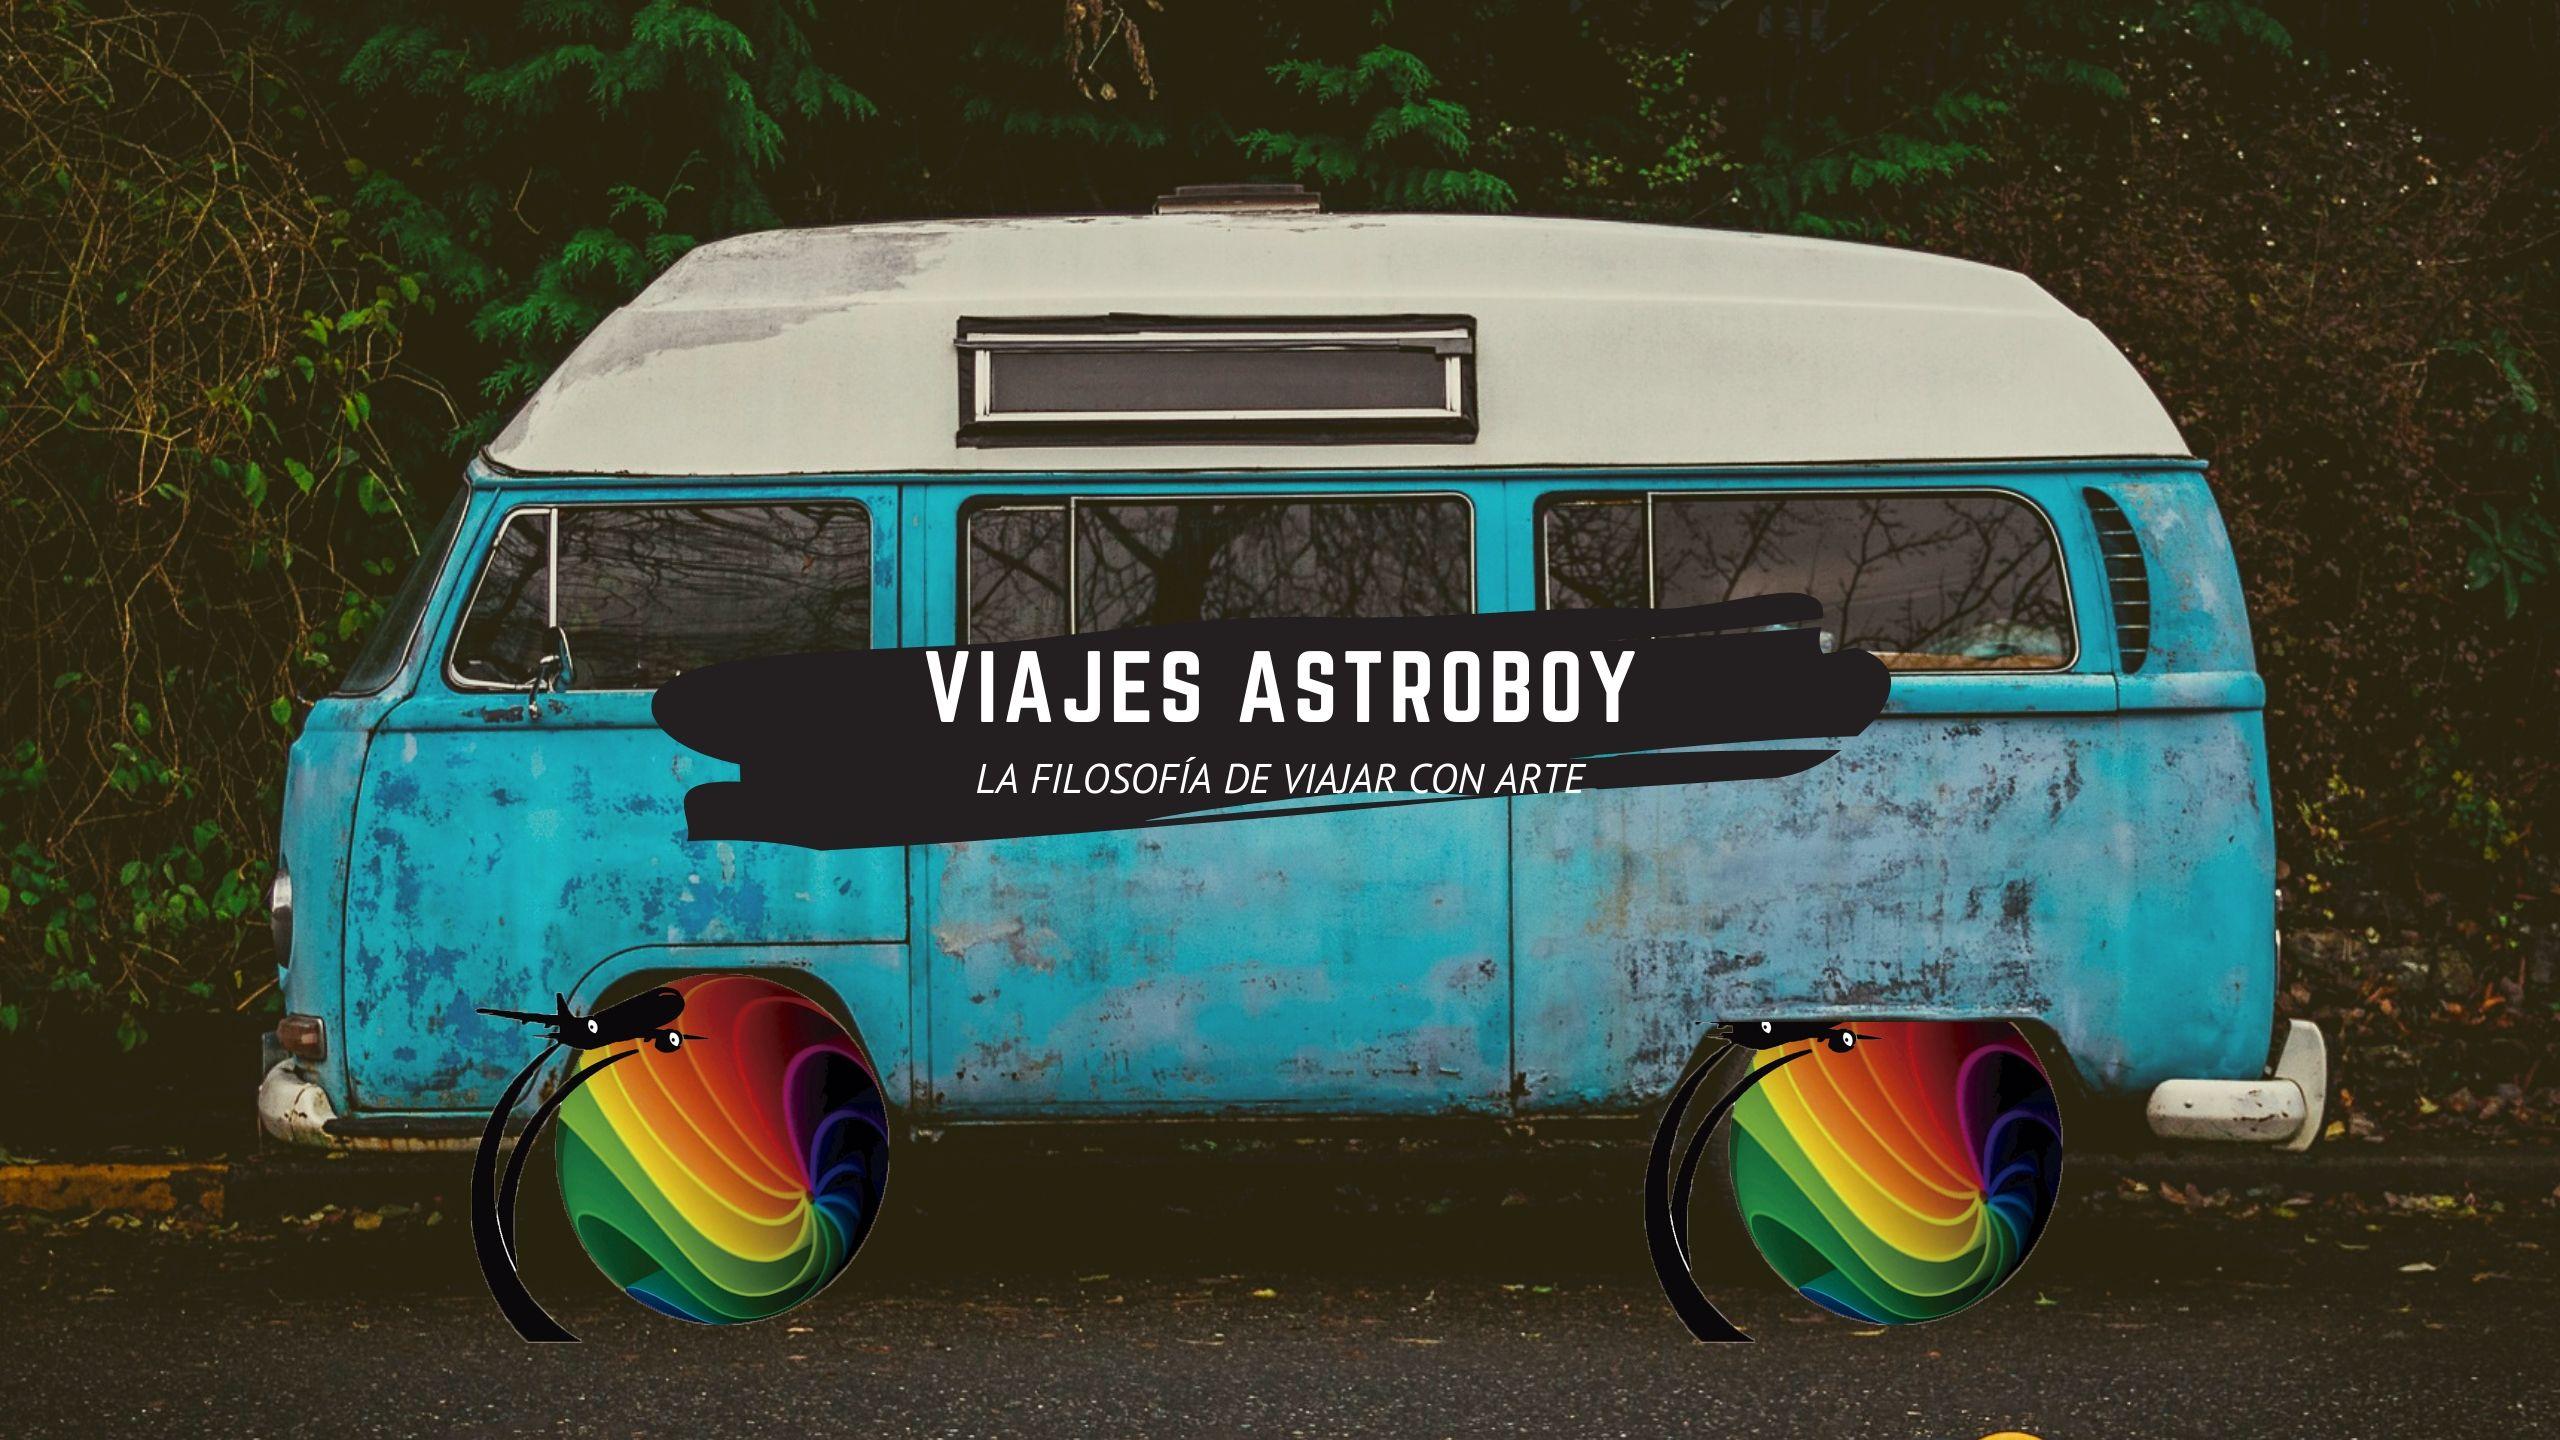 viajes astroboy